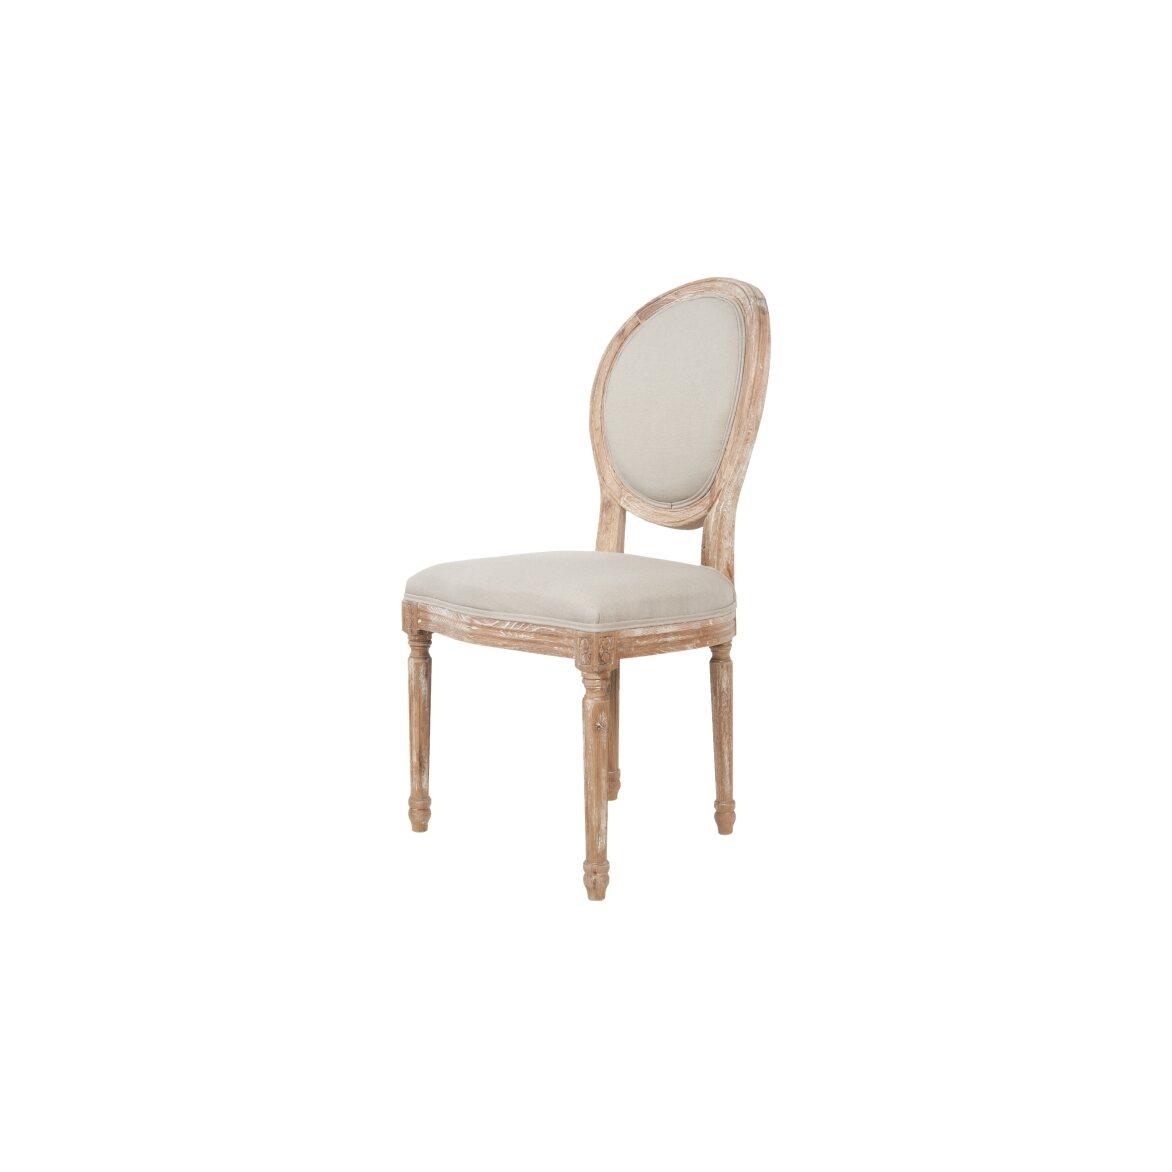 Стул Miro beige 4 | Обеденные стулья Kingsby